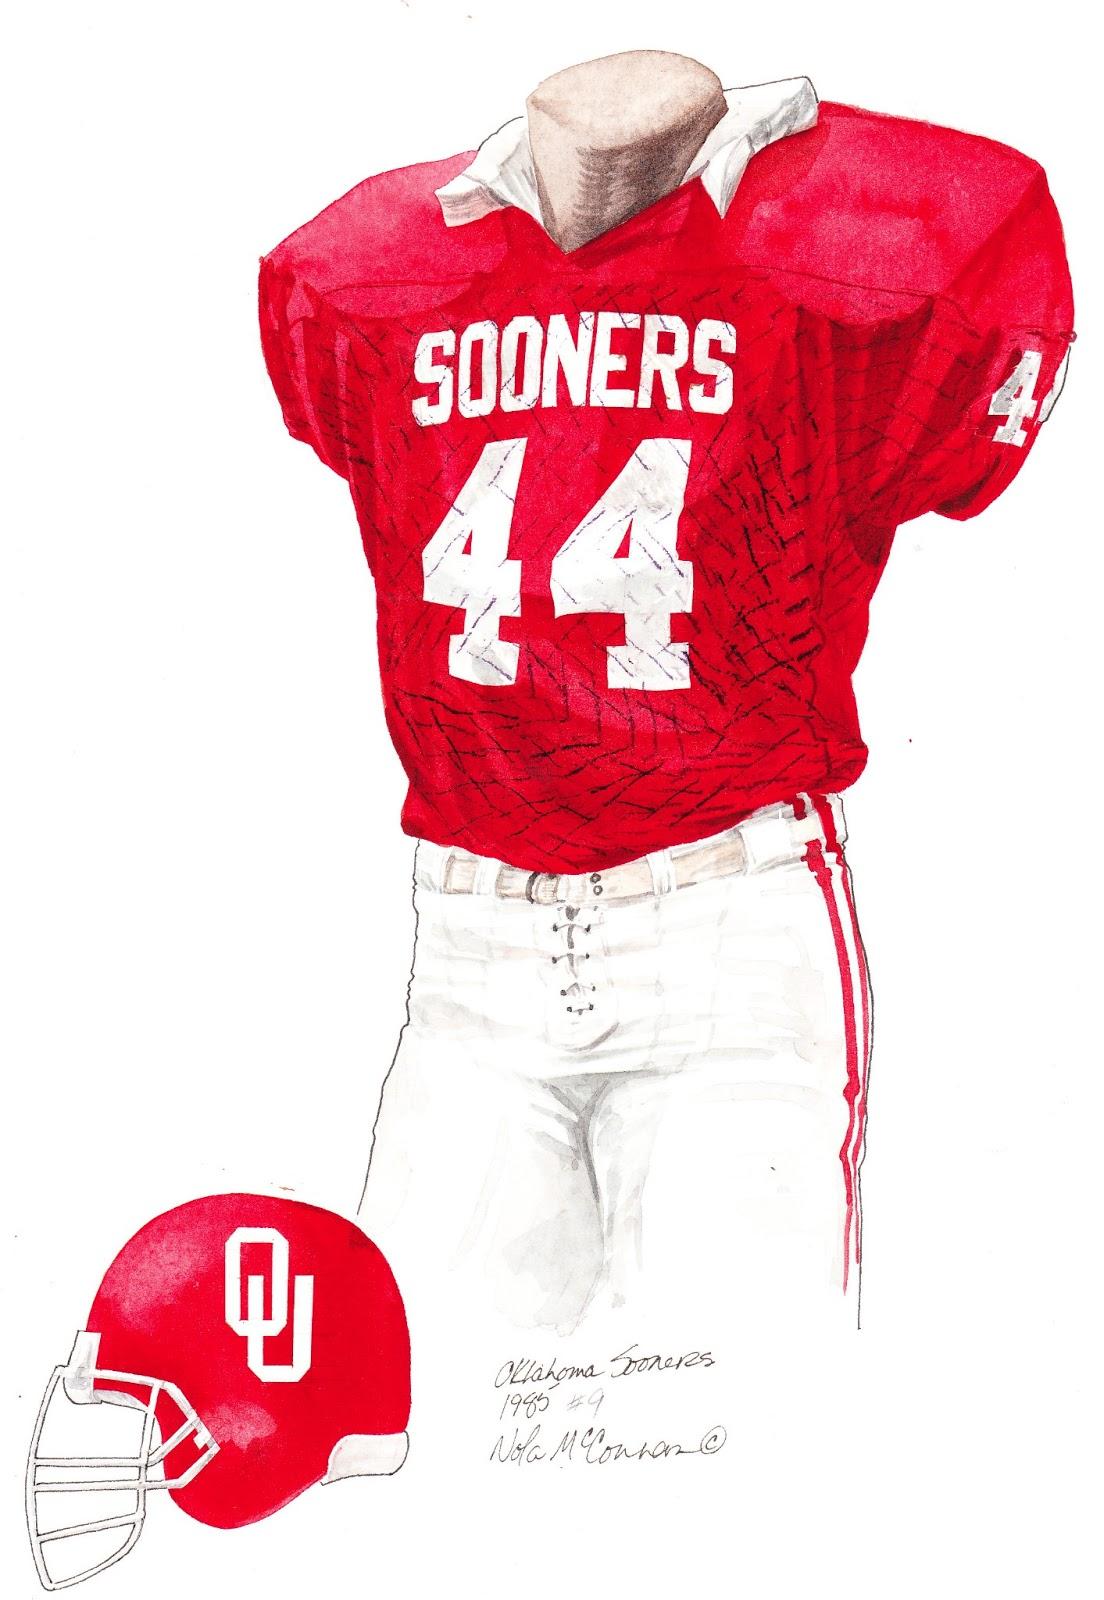 1985 University of Oklahoma Sooners football uniform original art for sale 5cad2ae64